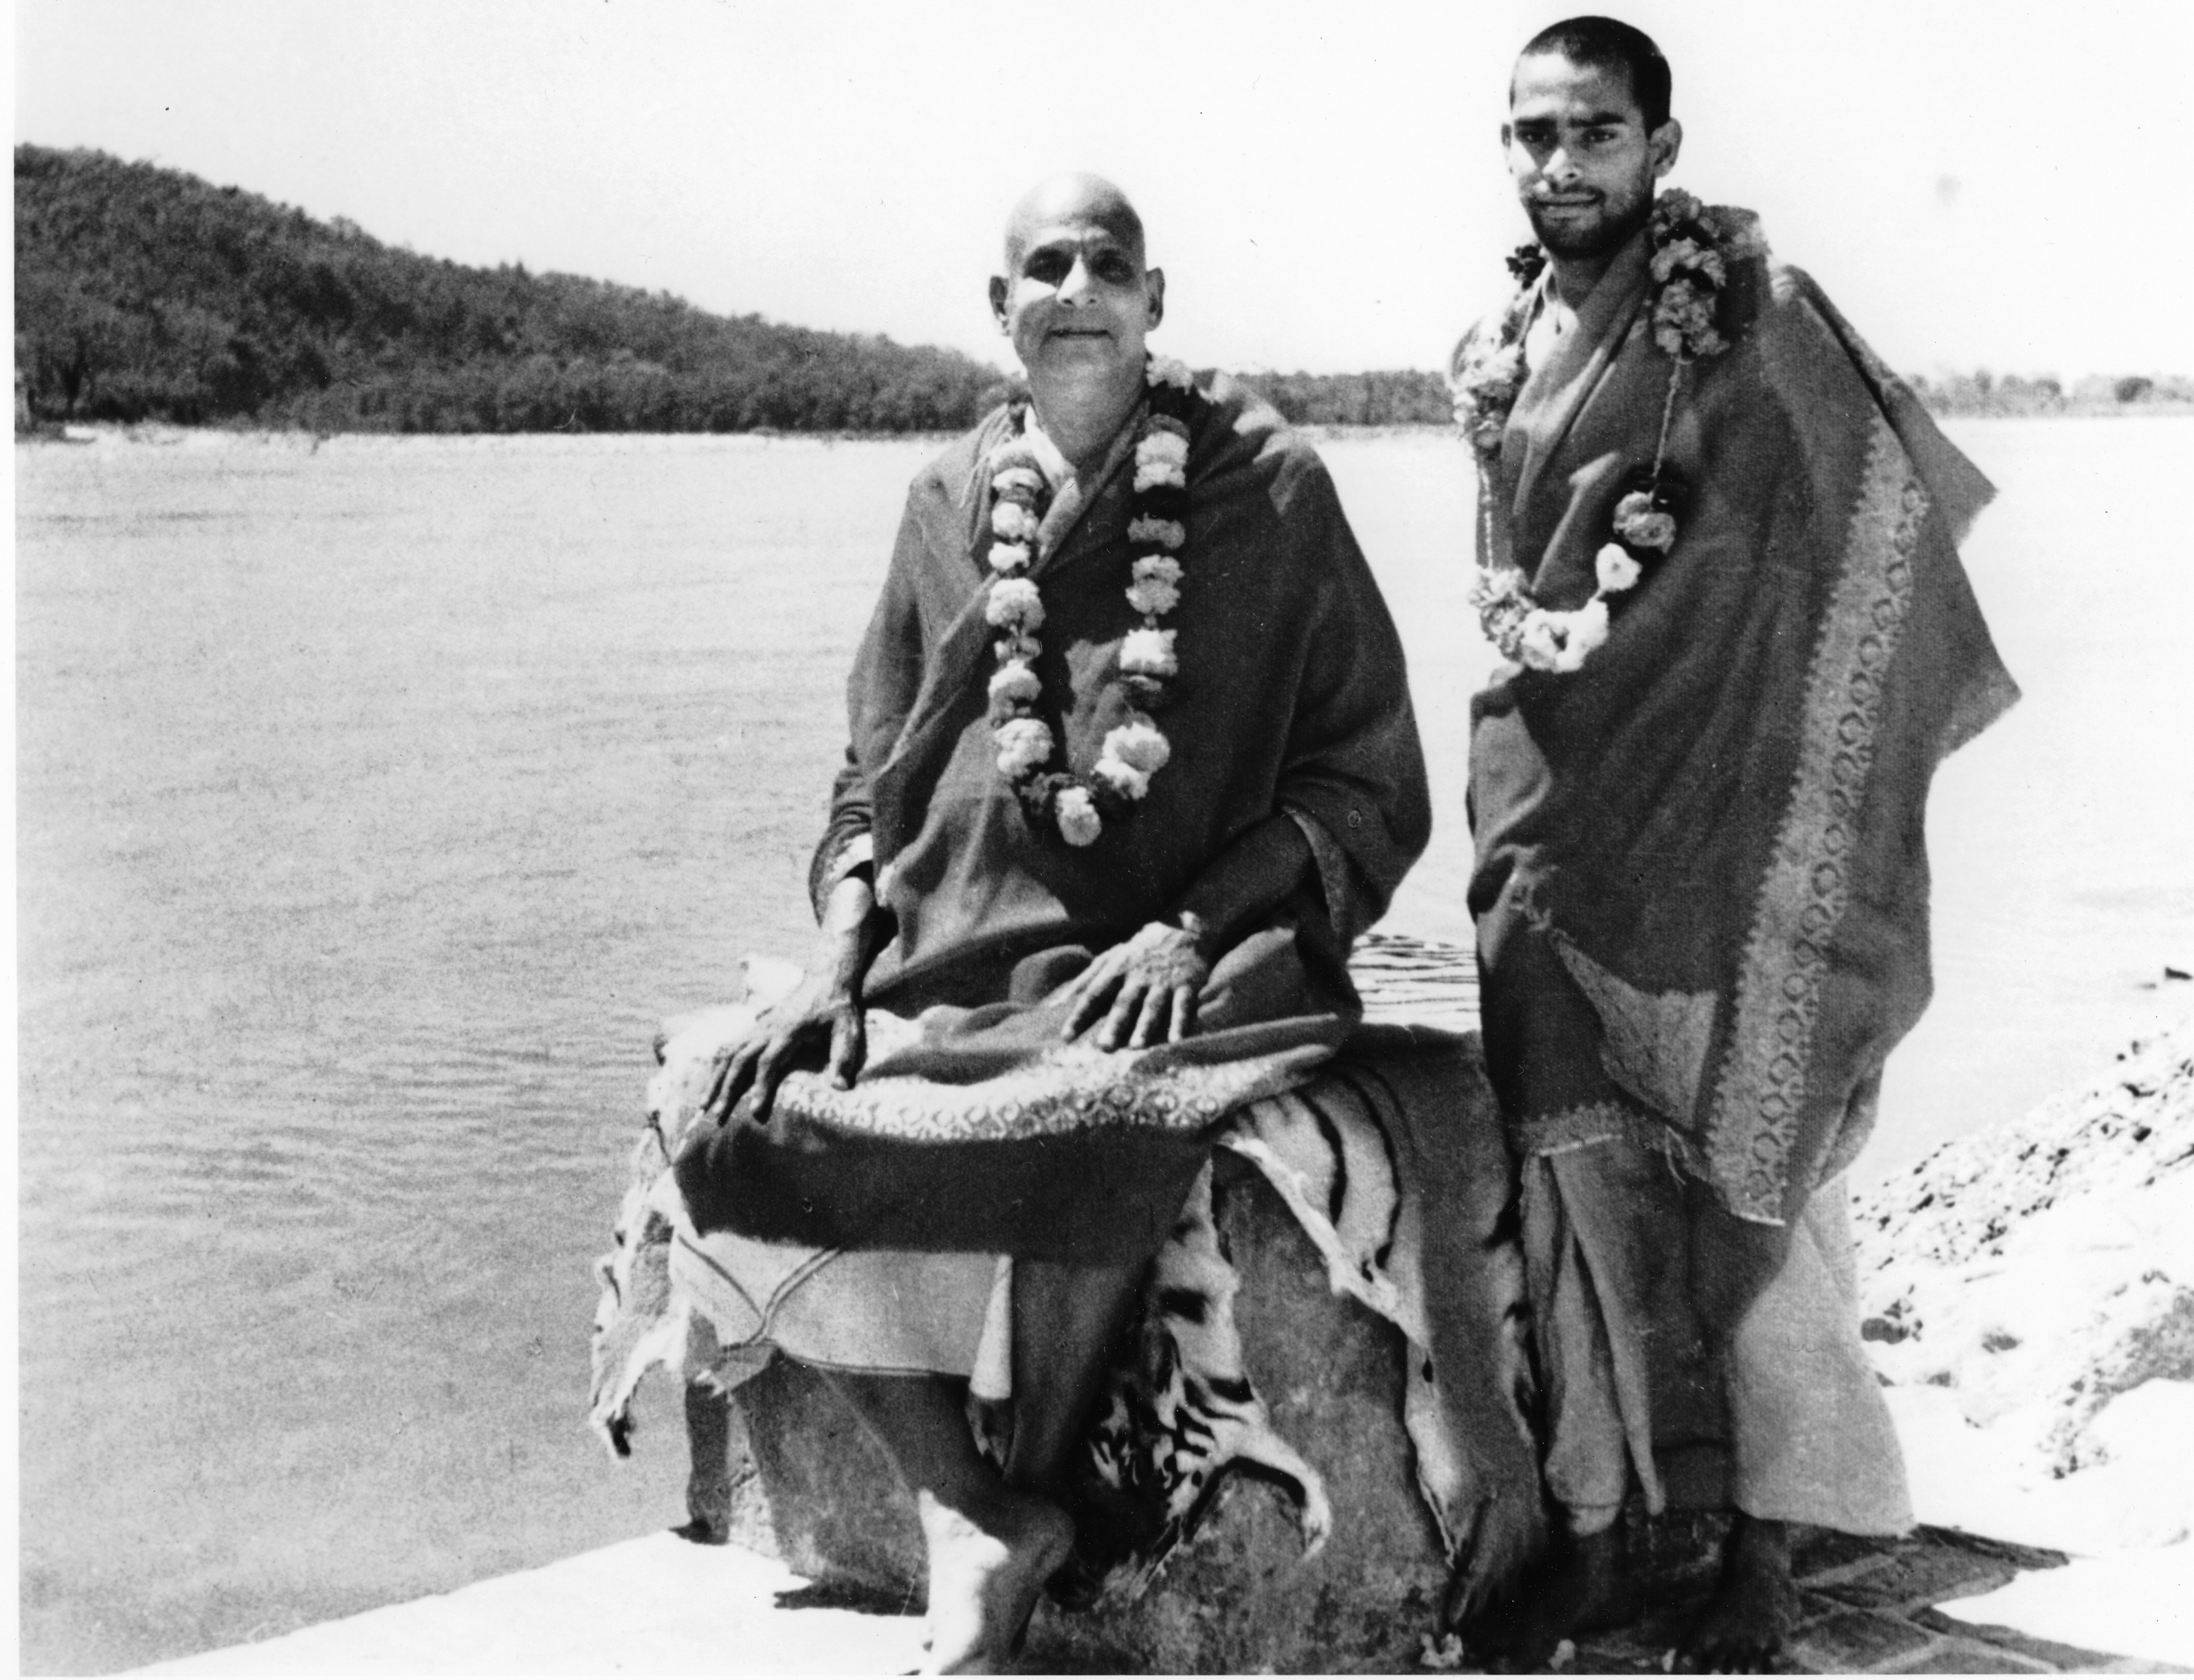 File:Swami Sivananda Swami Vishnudevananda am Ganges.jpg - Wikimedia Commons